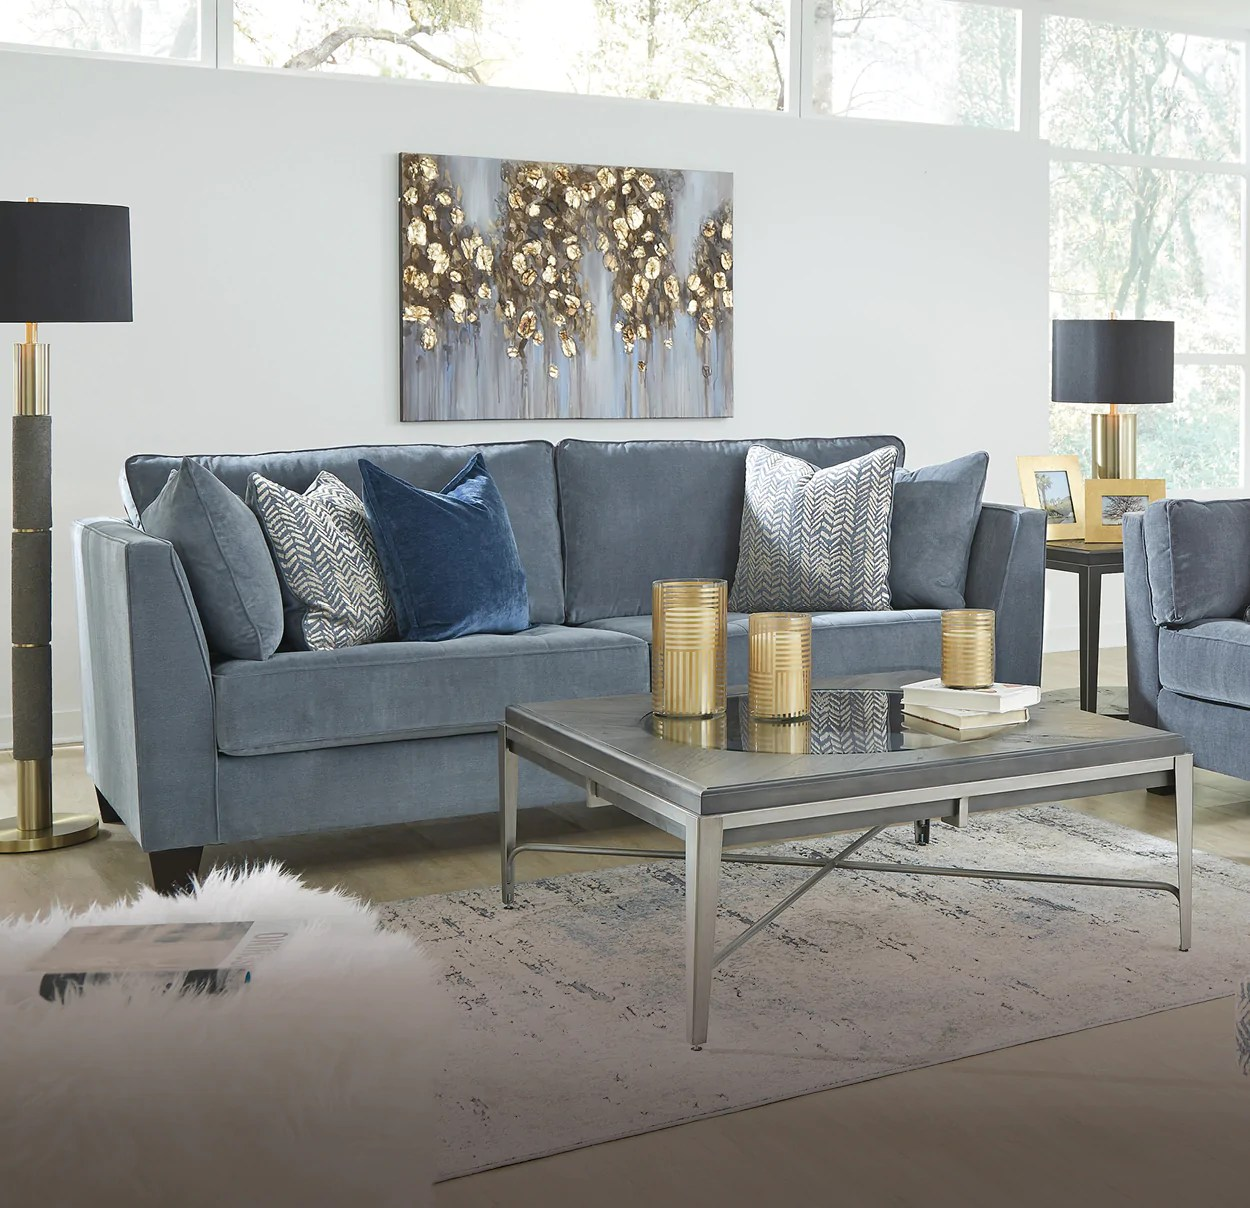 furniture stores living room simple interior design india ashley homestore canada